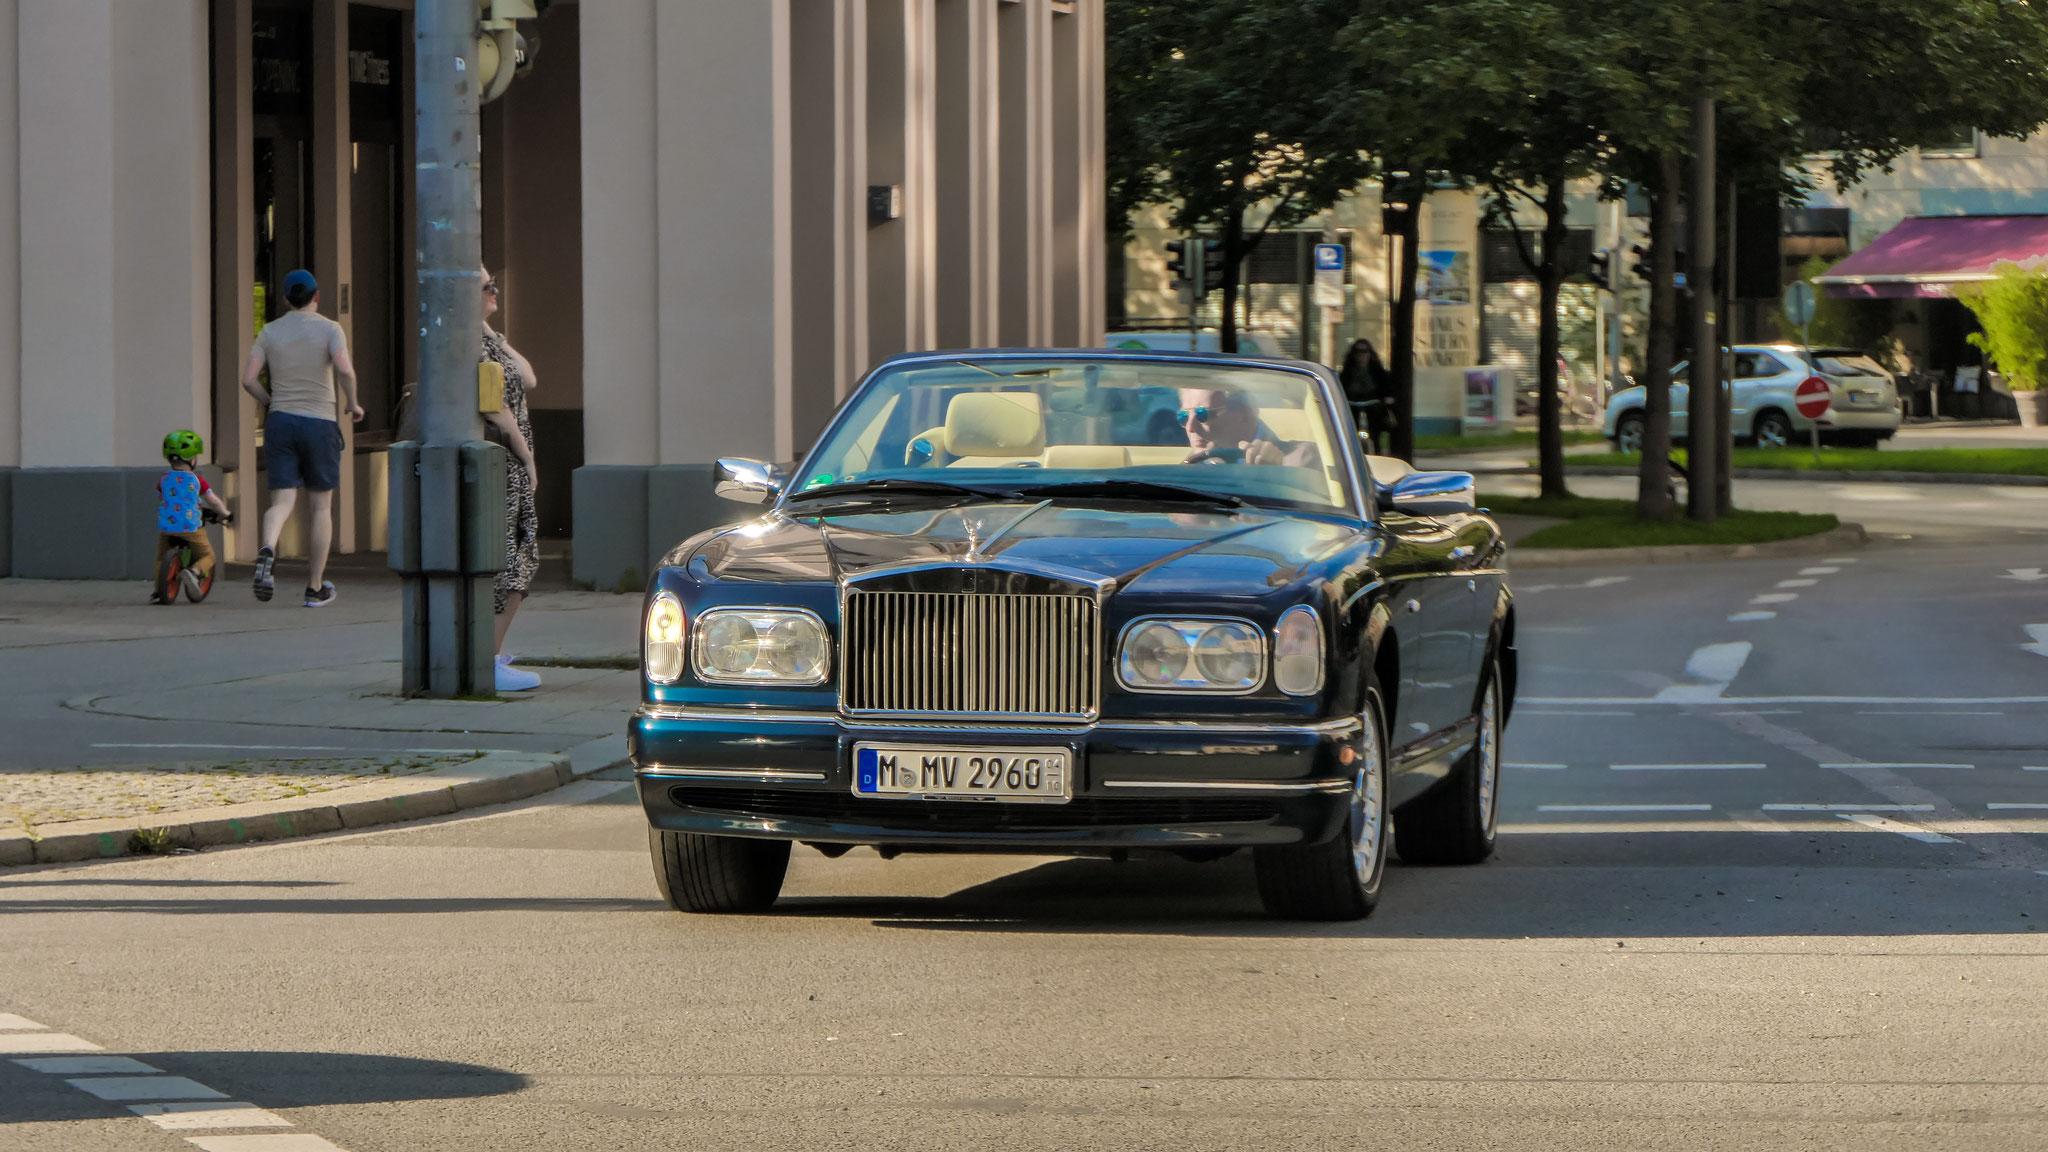 Rolls Royce Corniche V - M-MV-2960